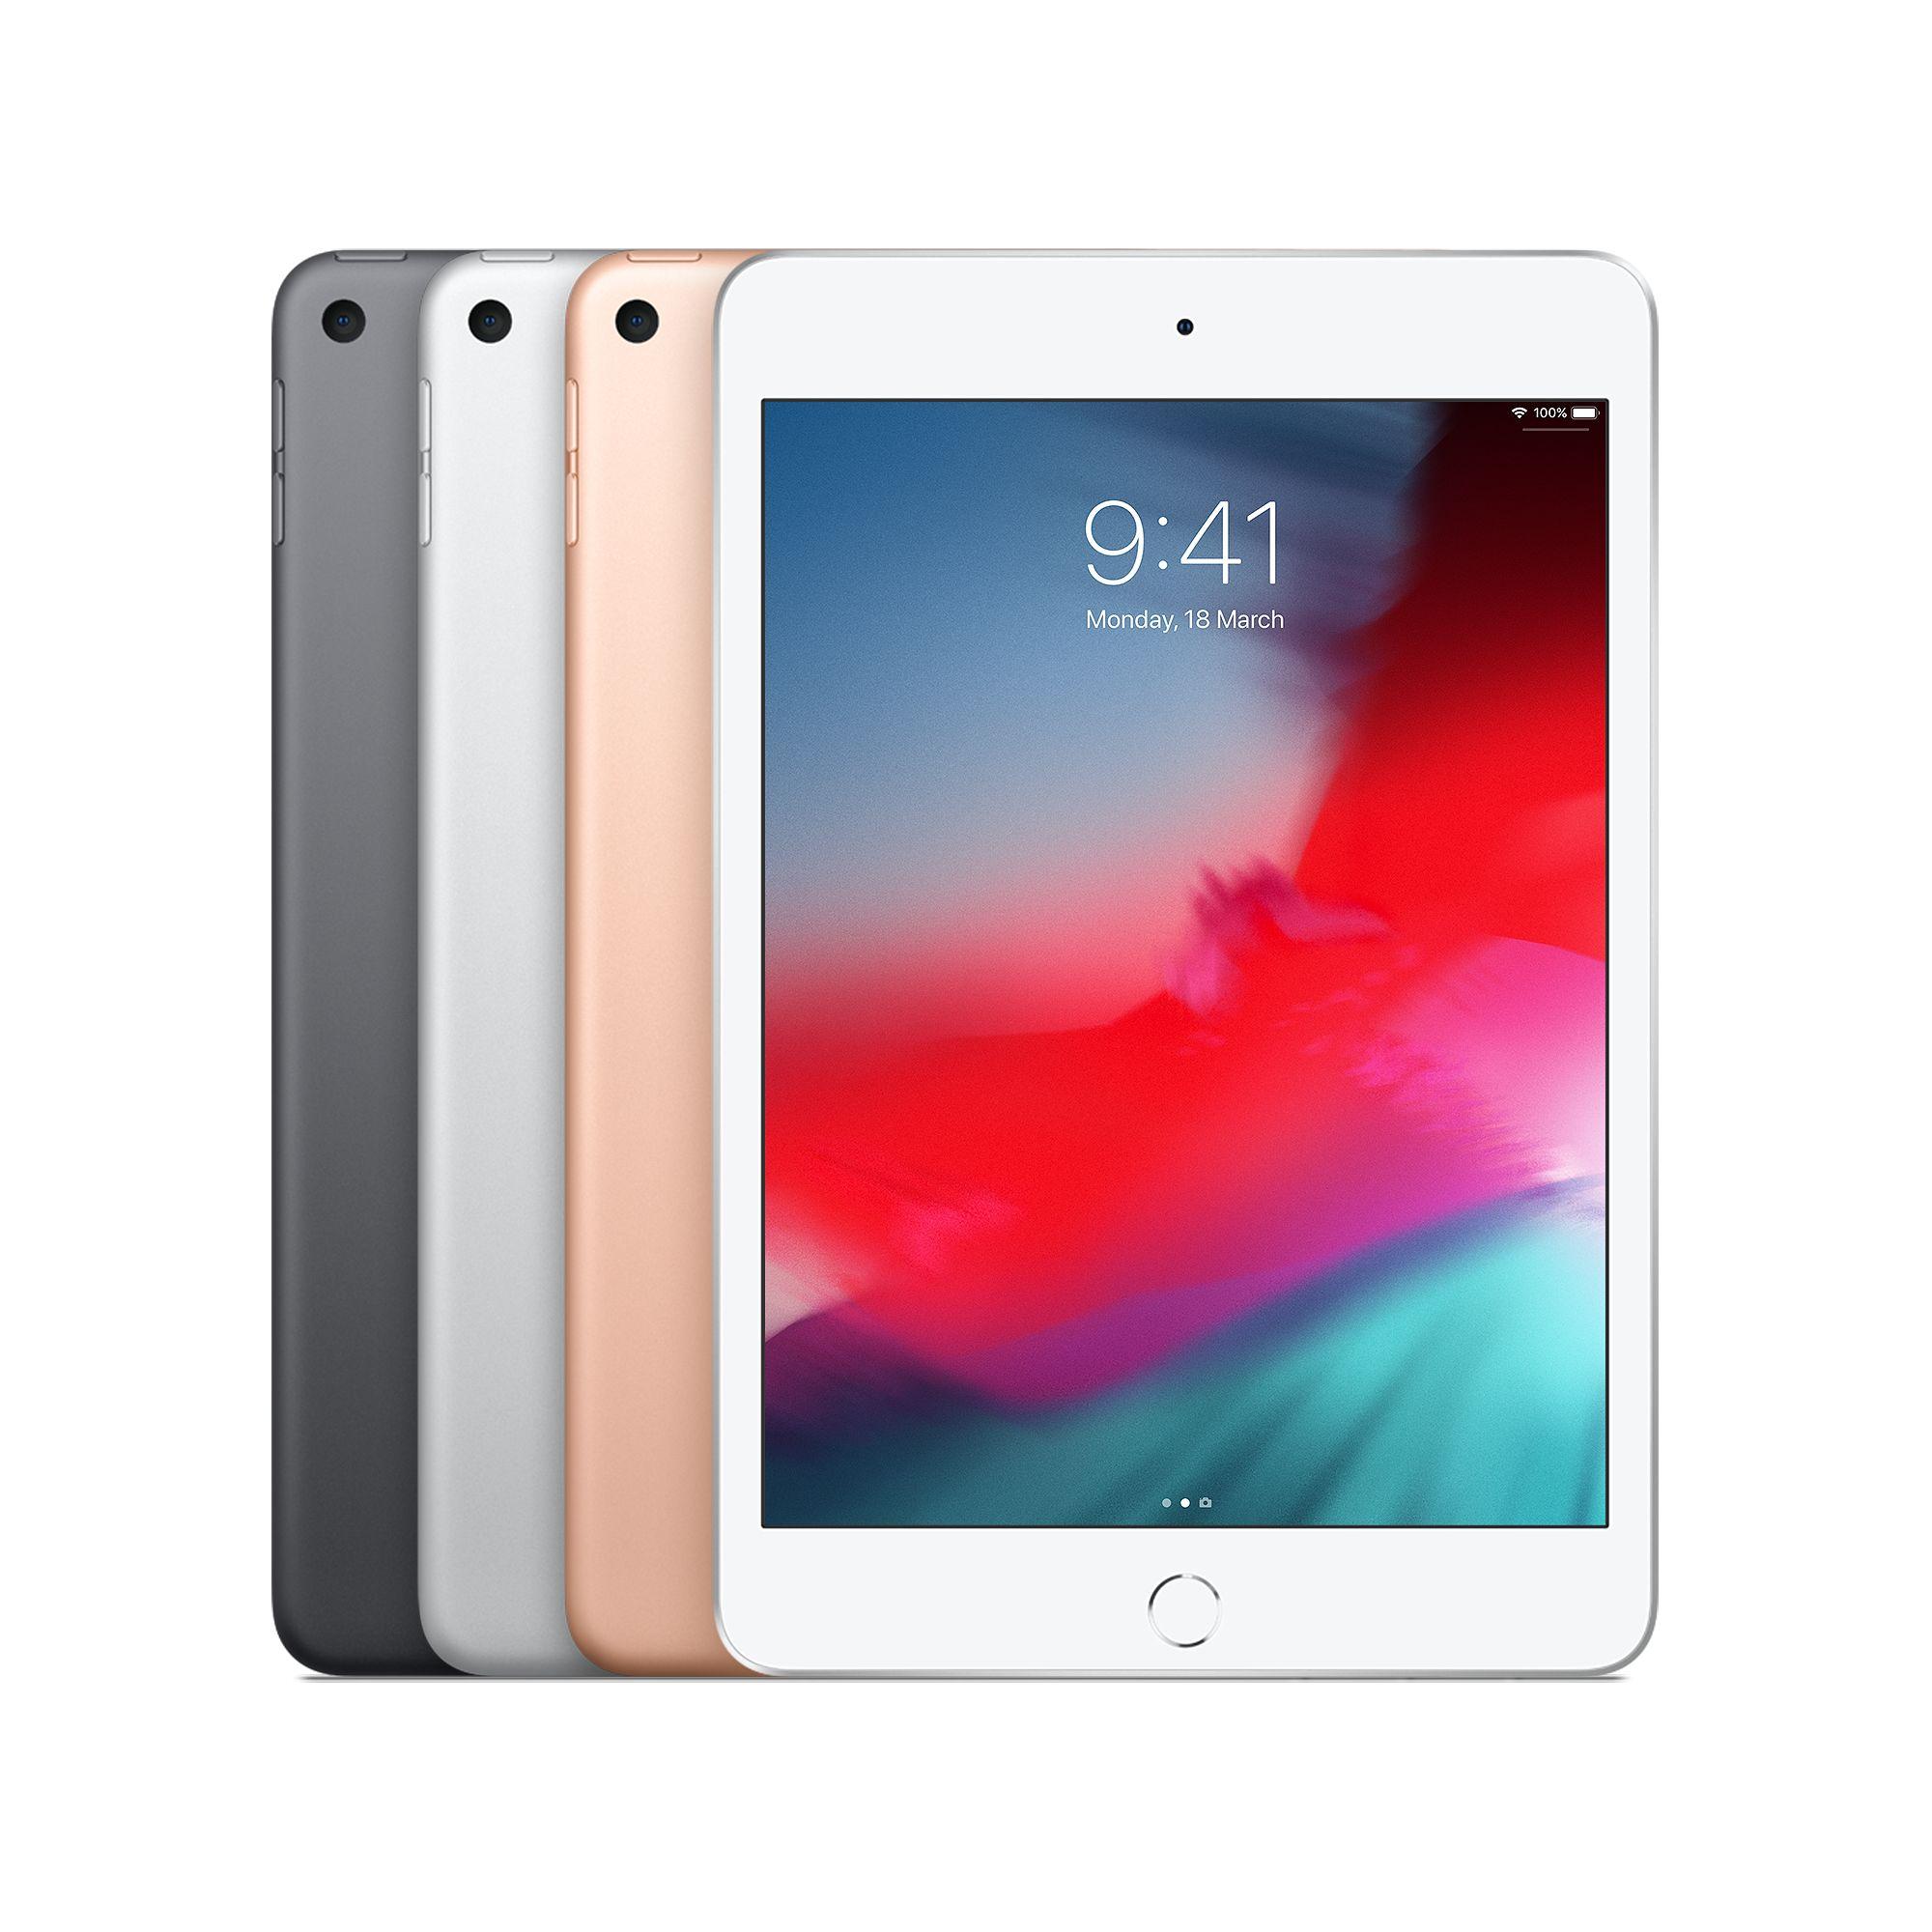 Apple iPad Mini 5 / 2019 - 64GB WiFi alle Farben über ebay.co.uk